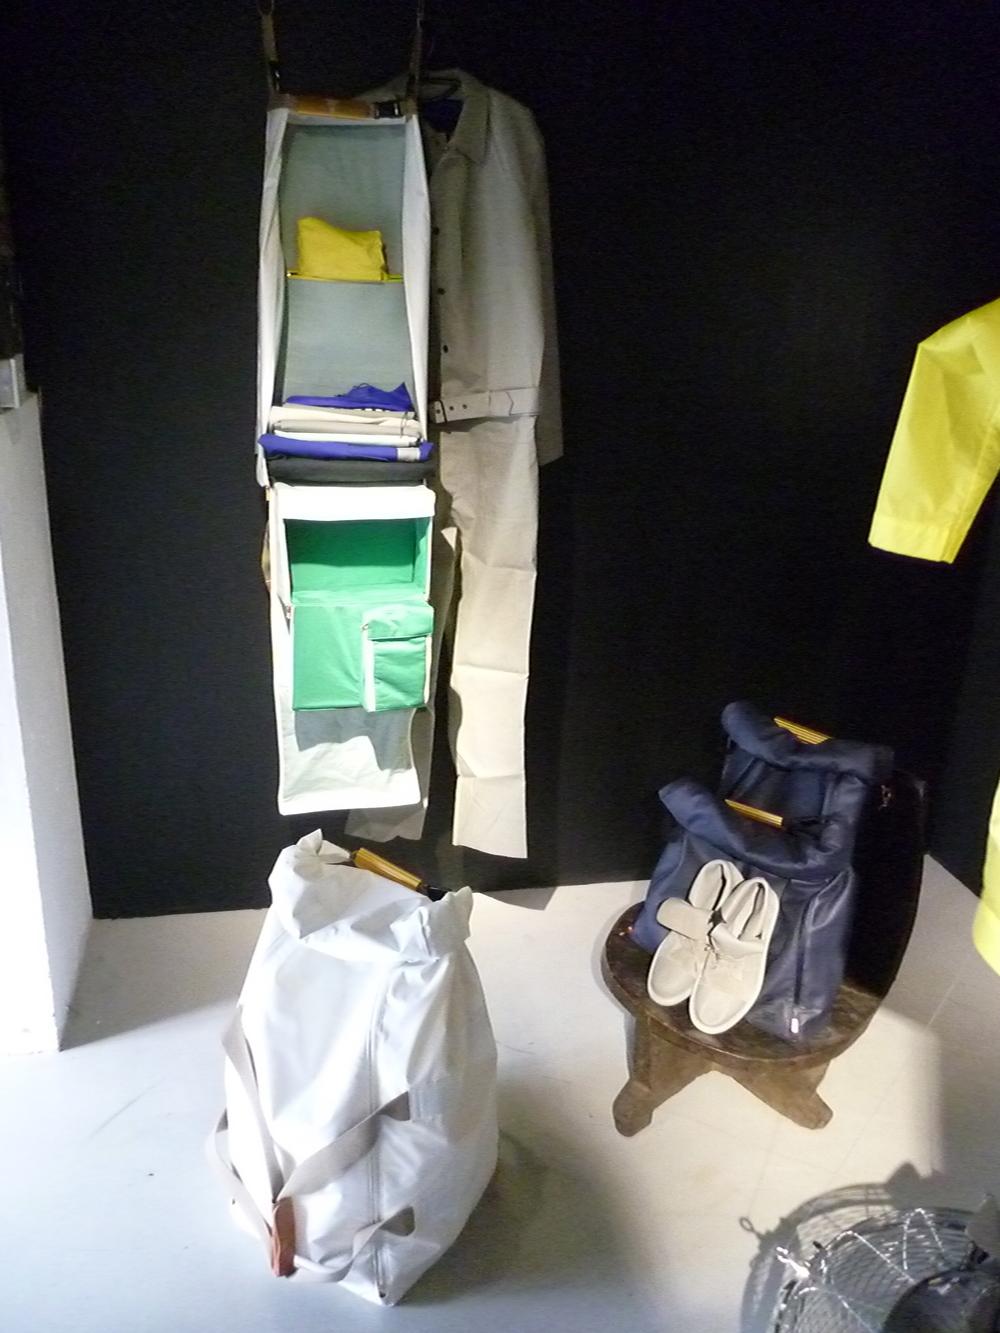 Tom Dixon/ Adidas at the Dock